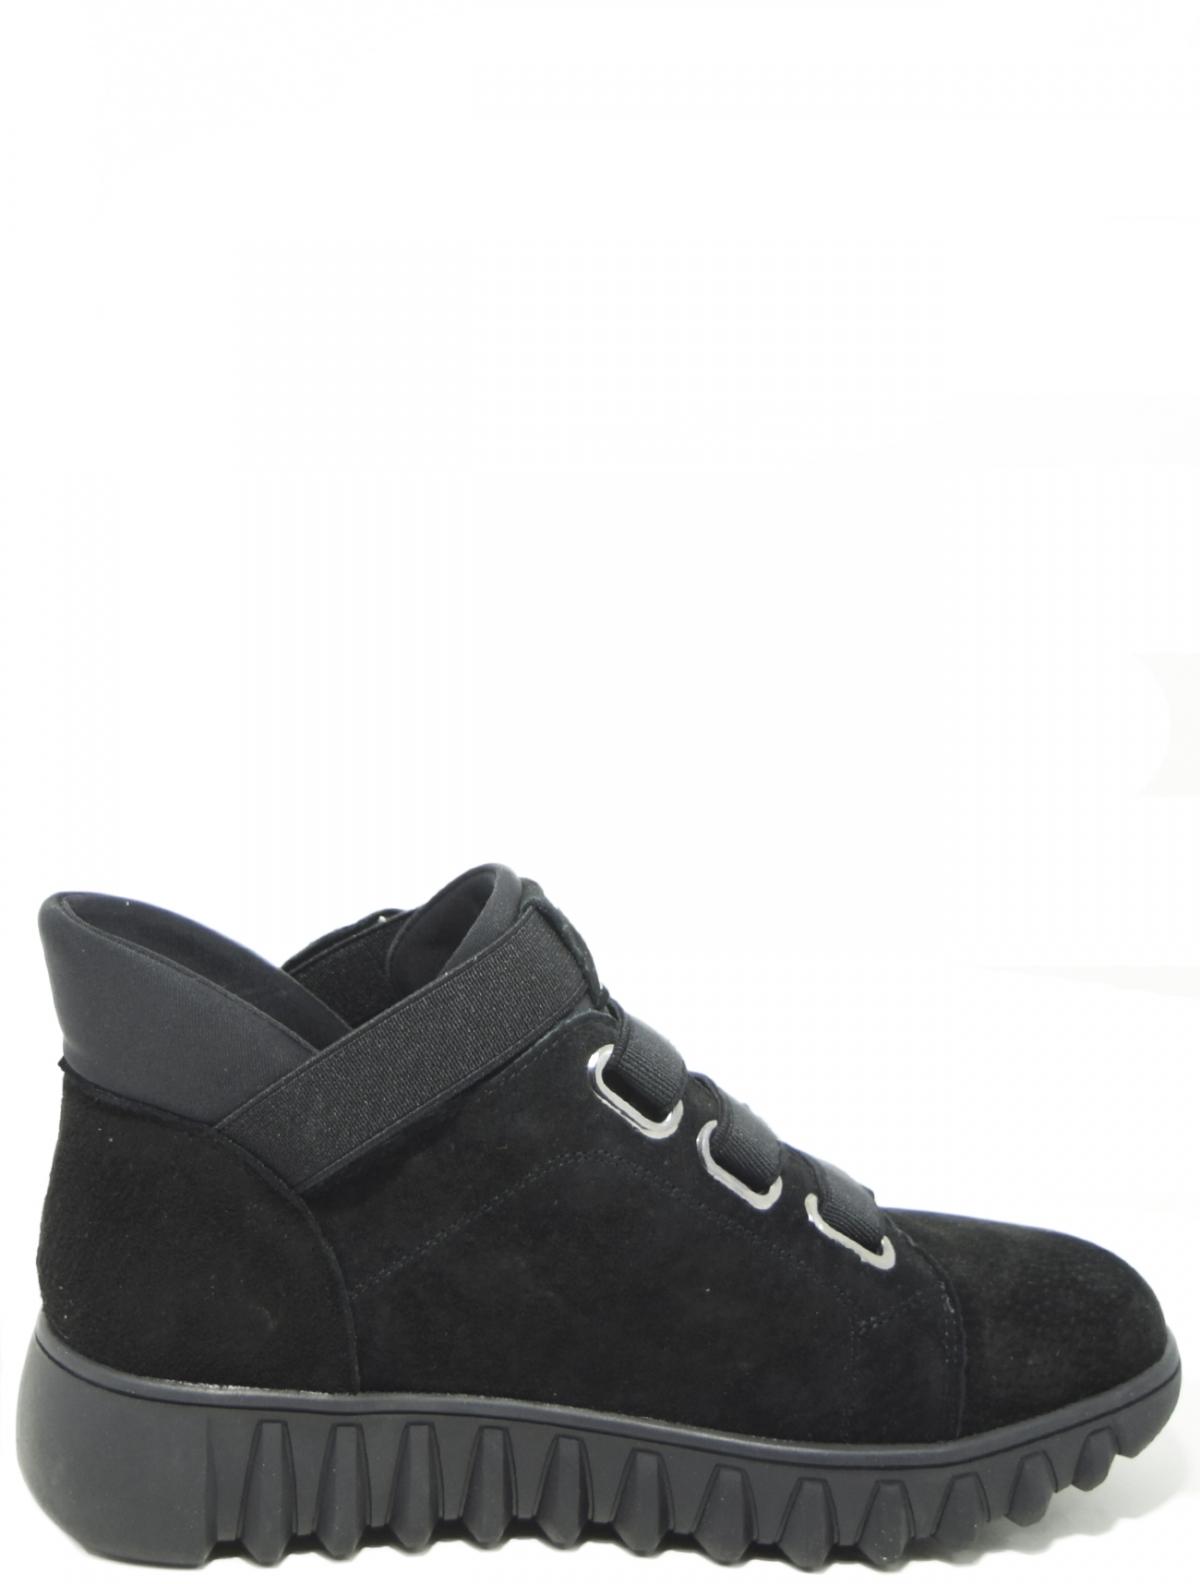 Rita Bravuro 190519-5 женские ботинки